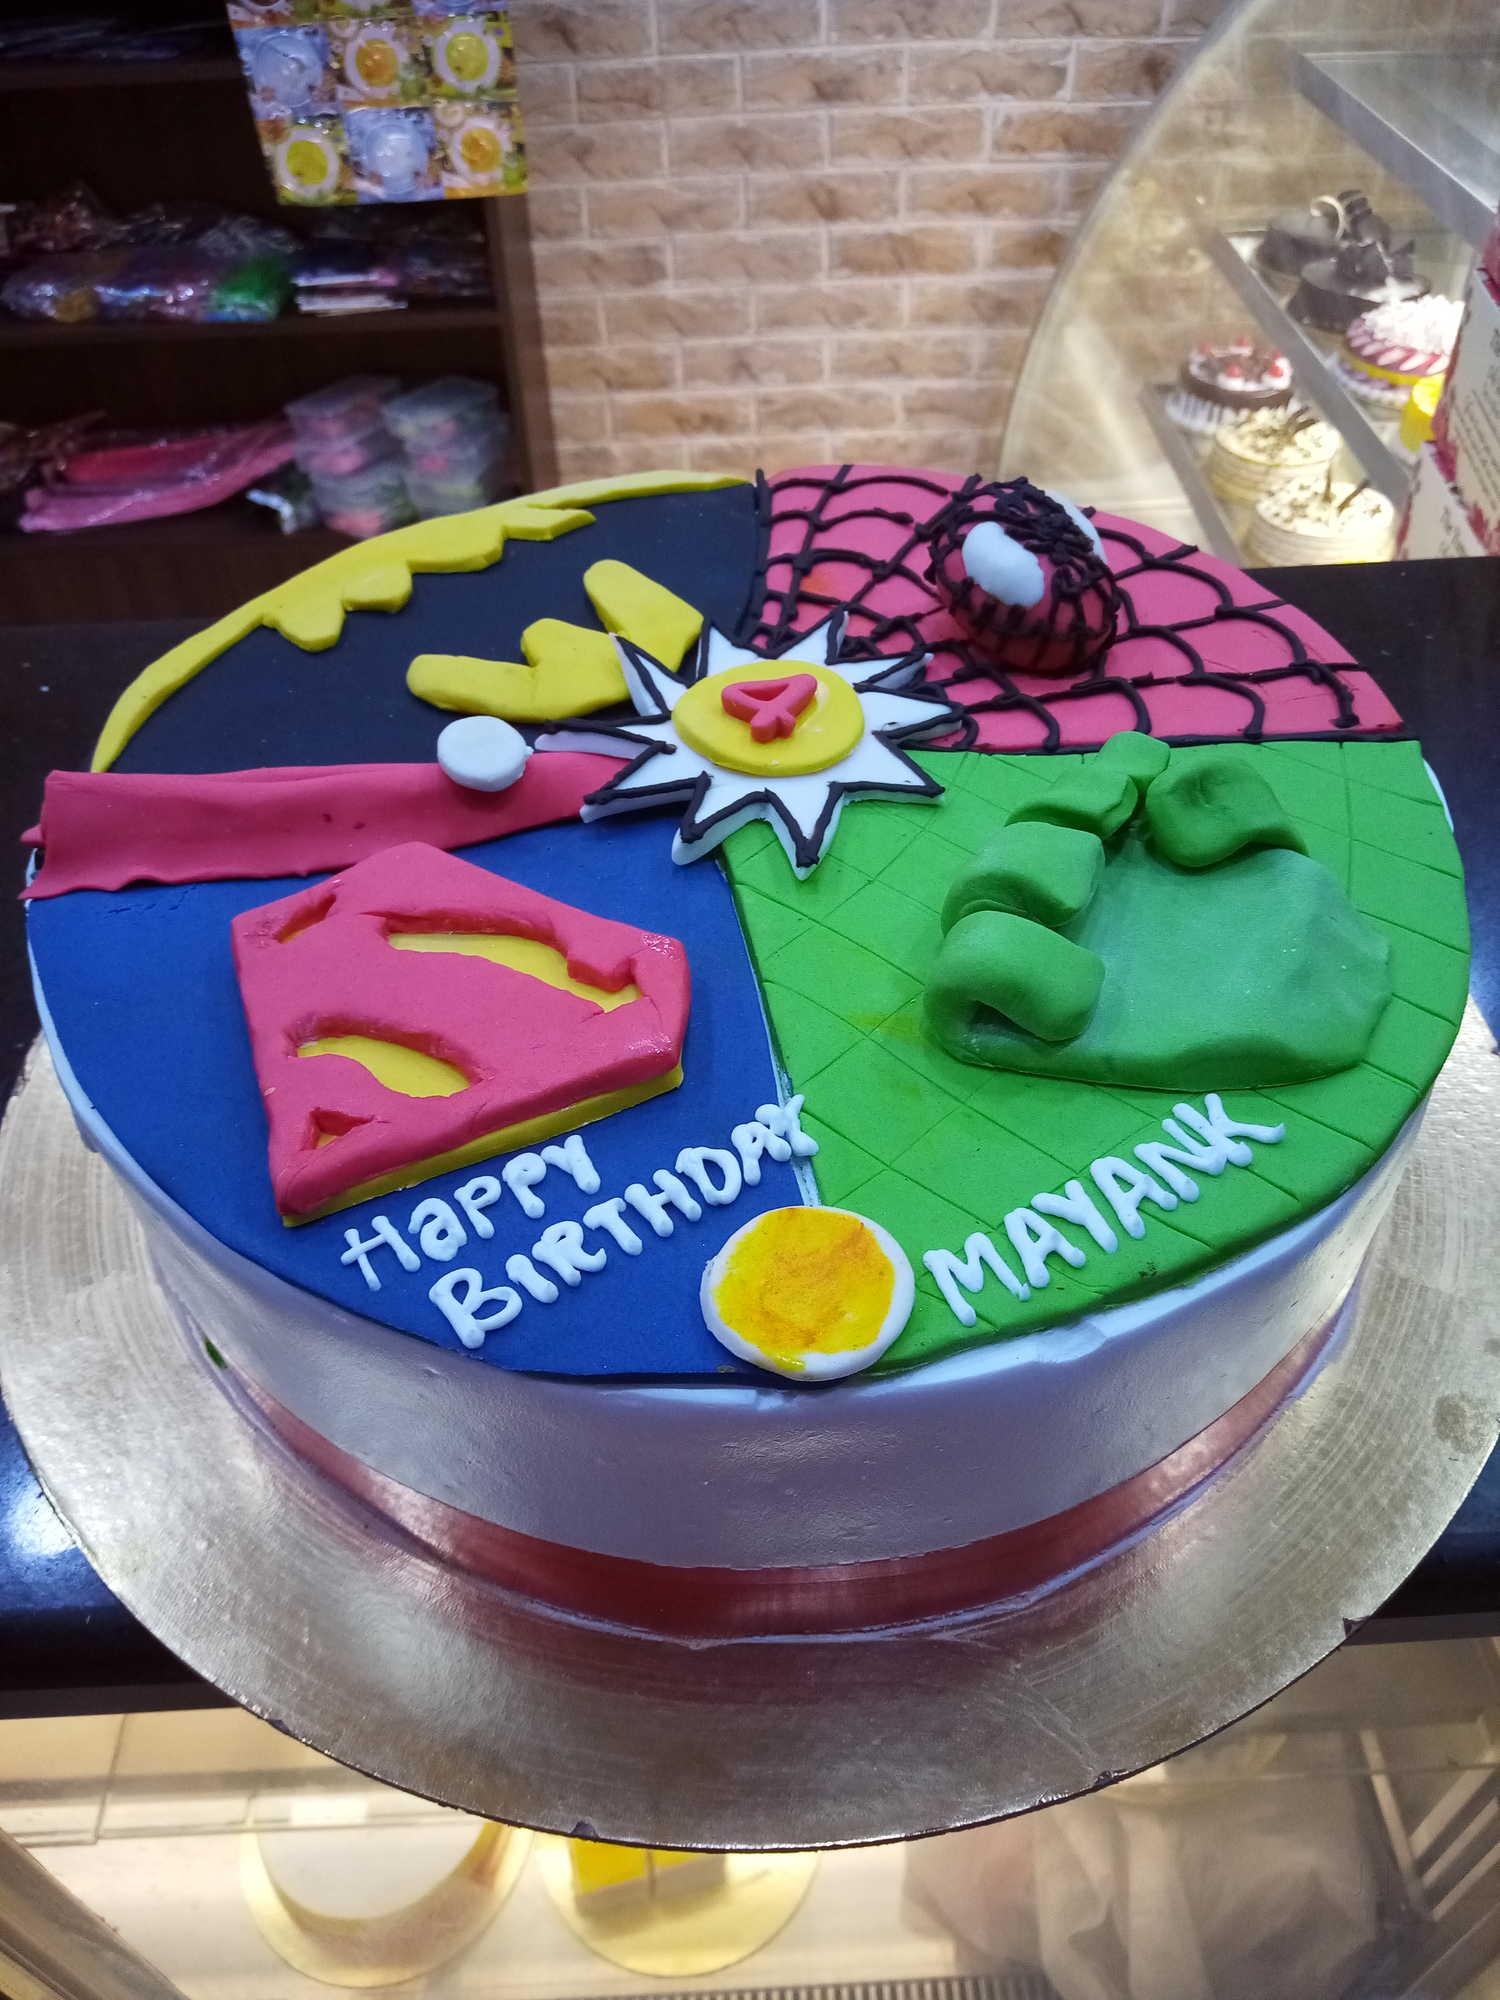 Cake Delivery Services In Shopprix Mall Noida Sector 61 Delhi